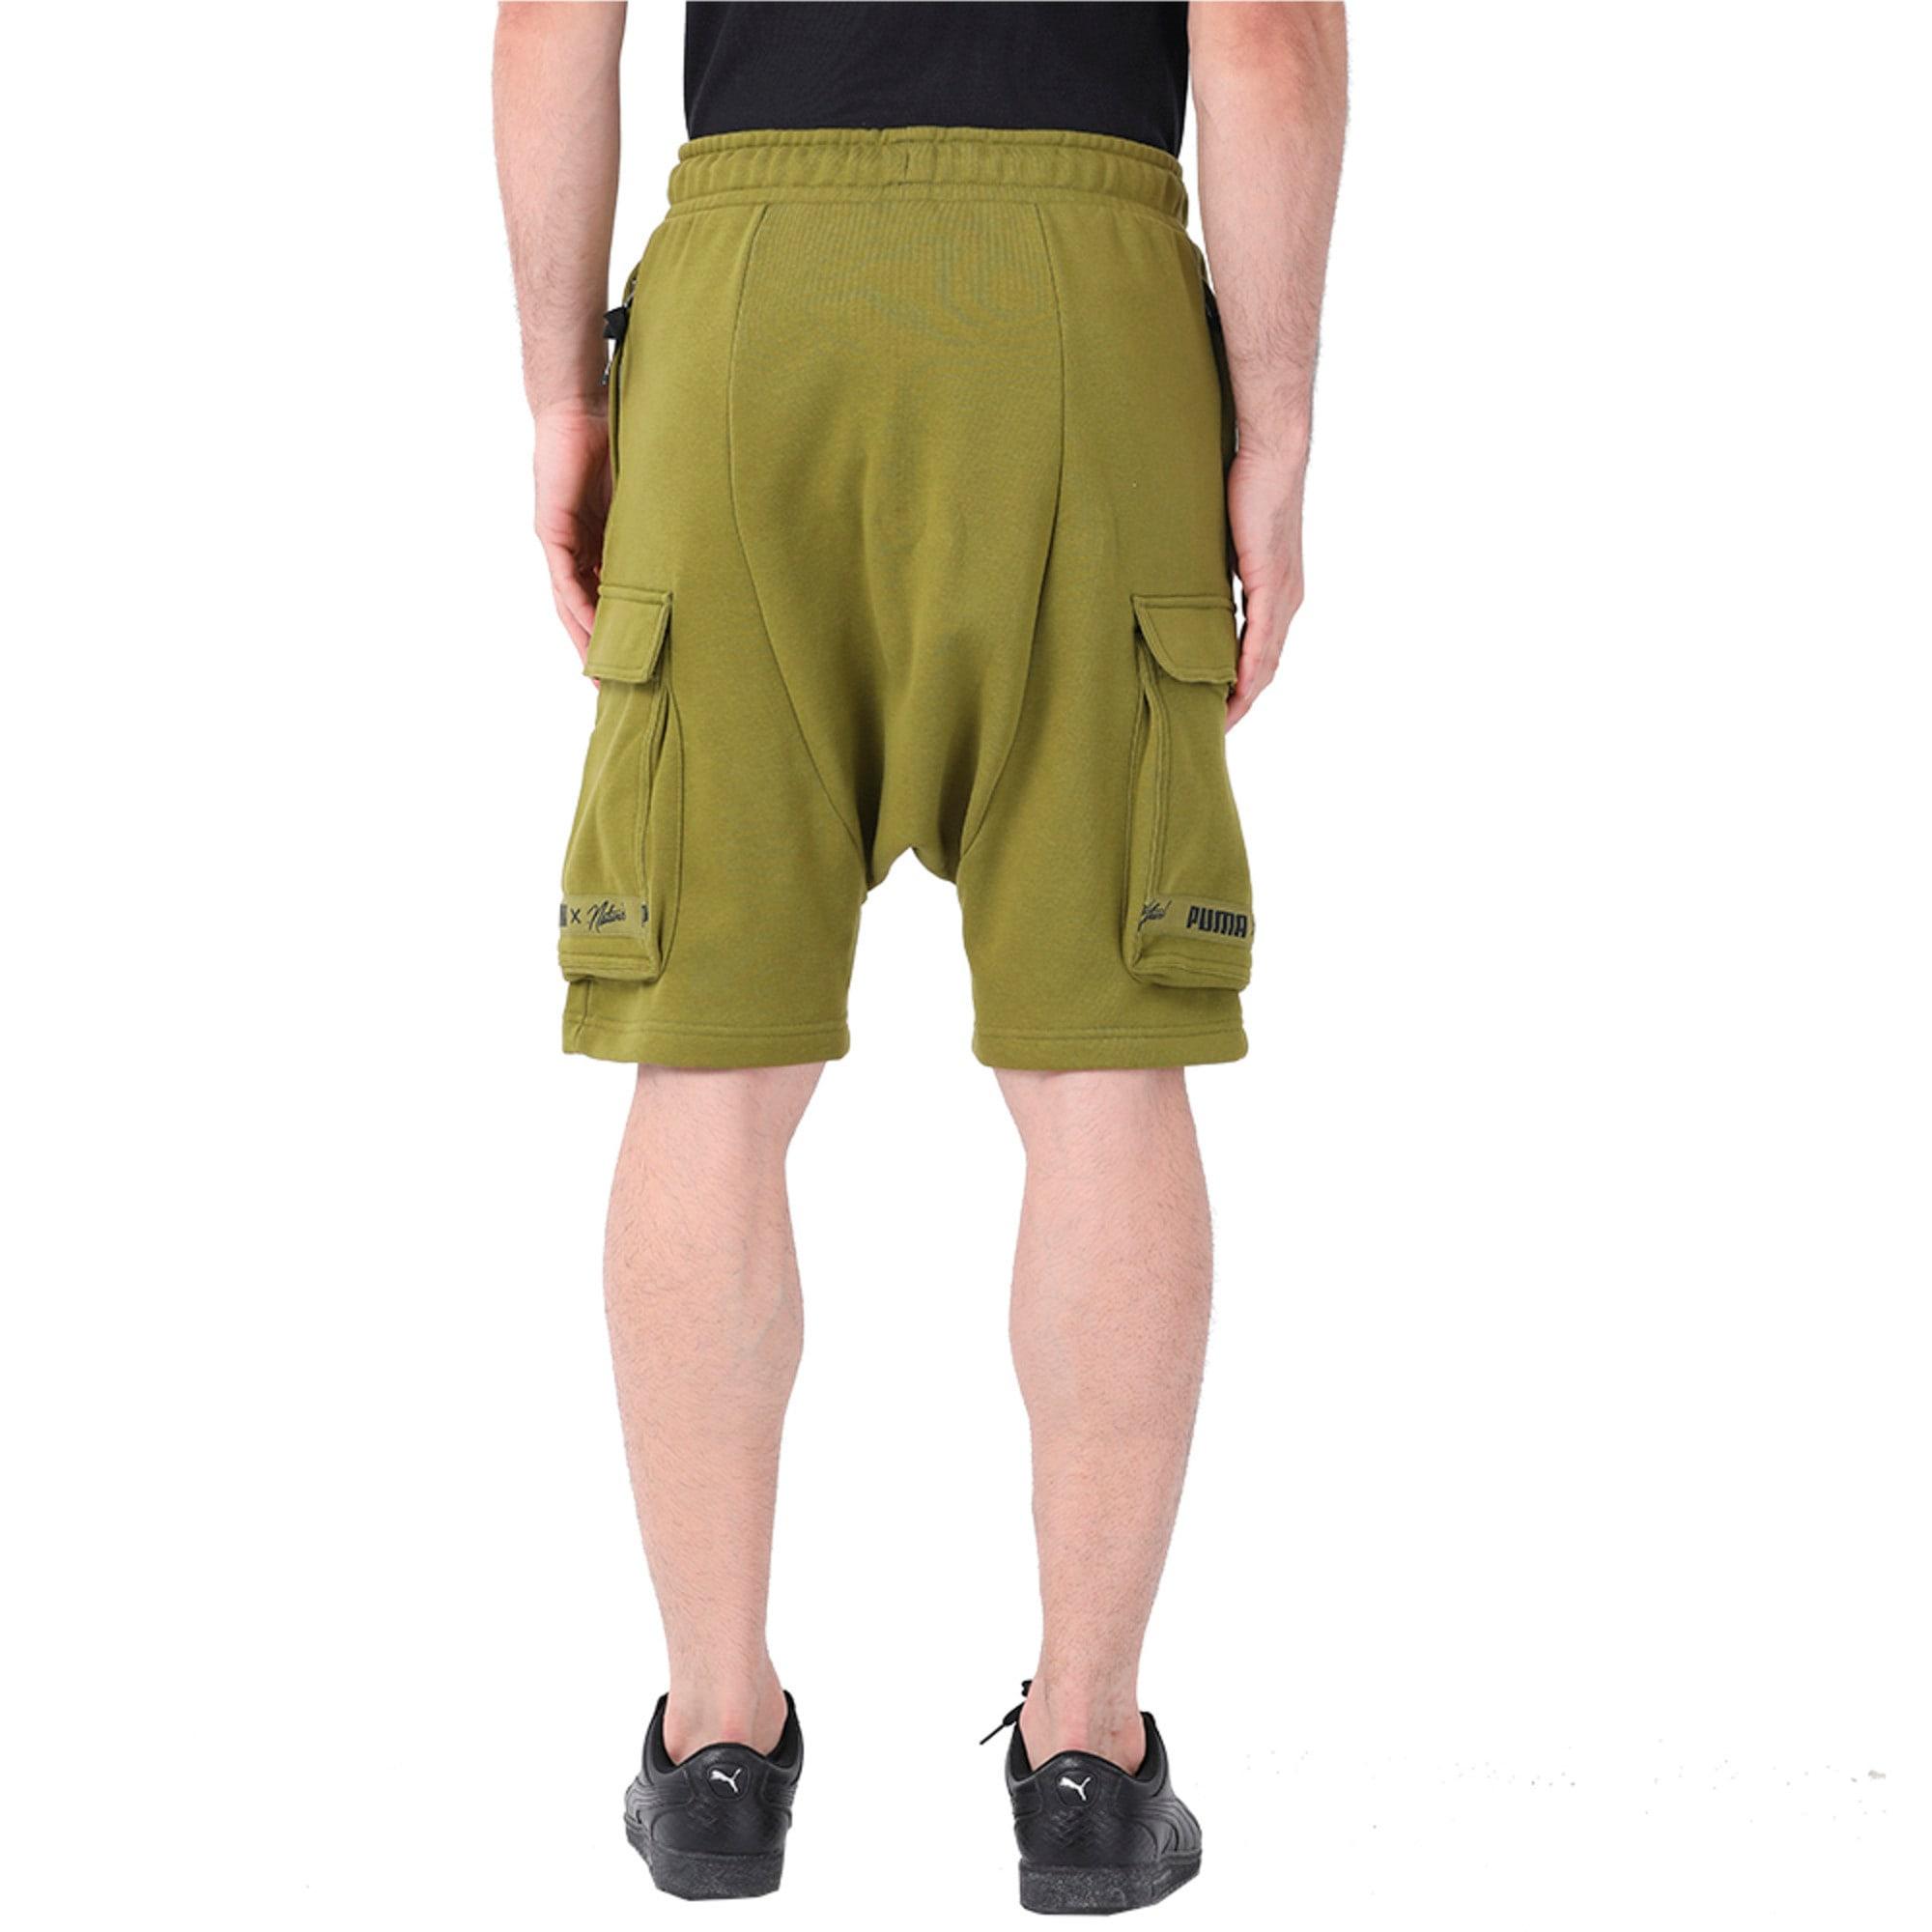 Thumbnail 1 of PUMA x NATUREL Men's Shorts, Avocado, medium-IND